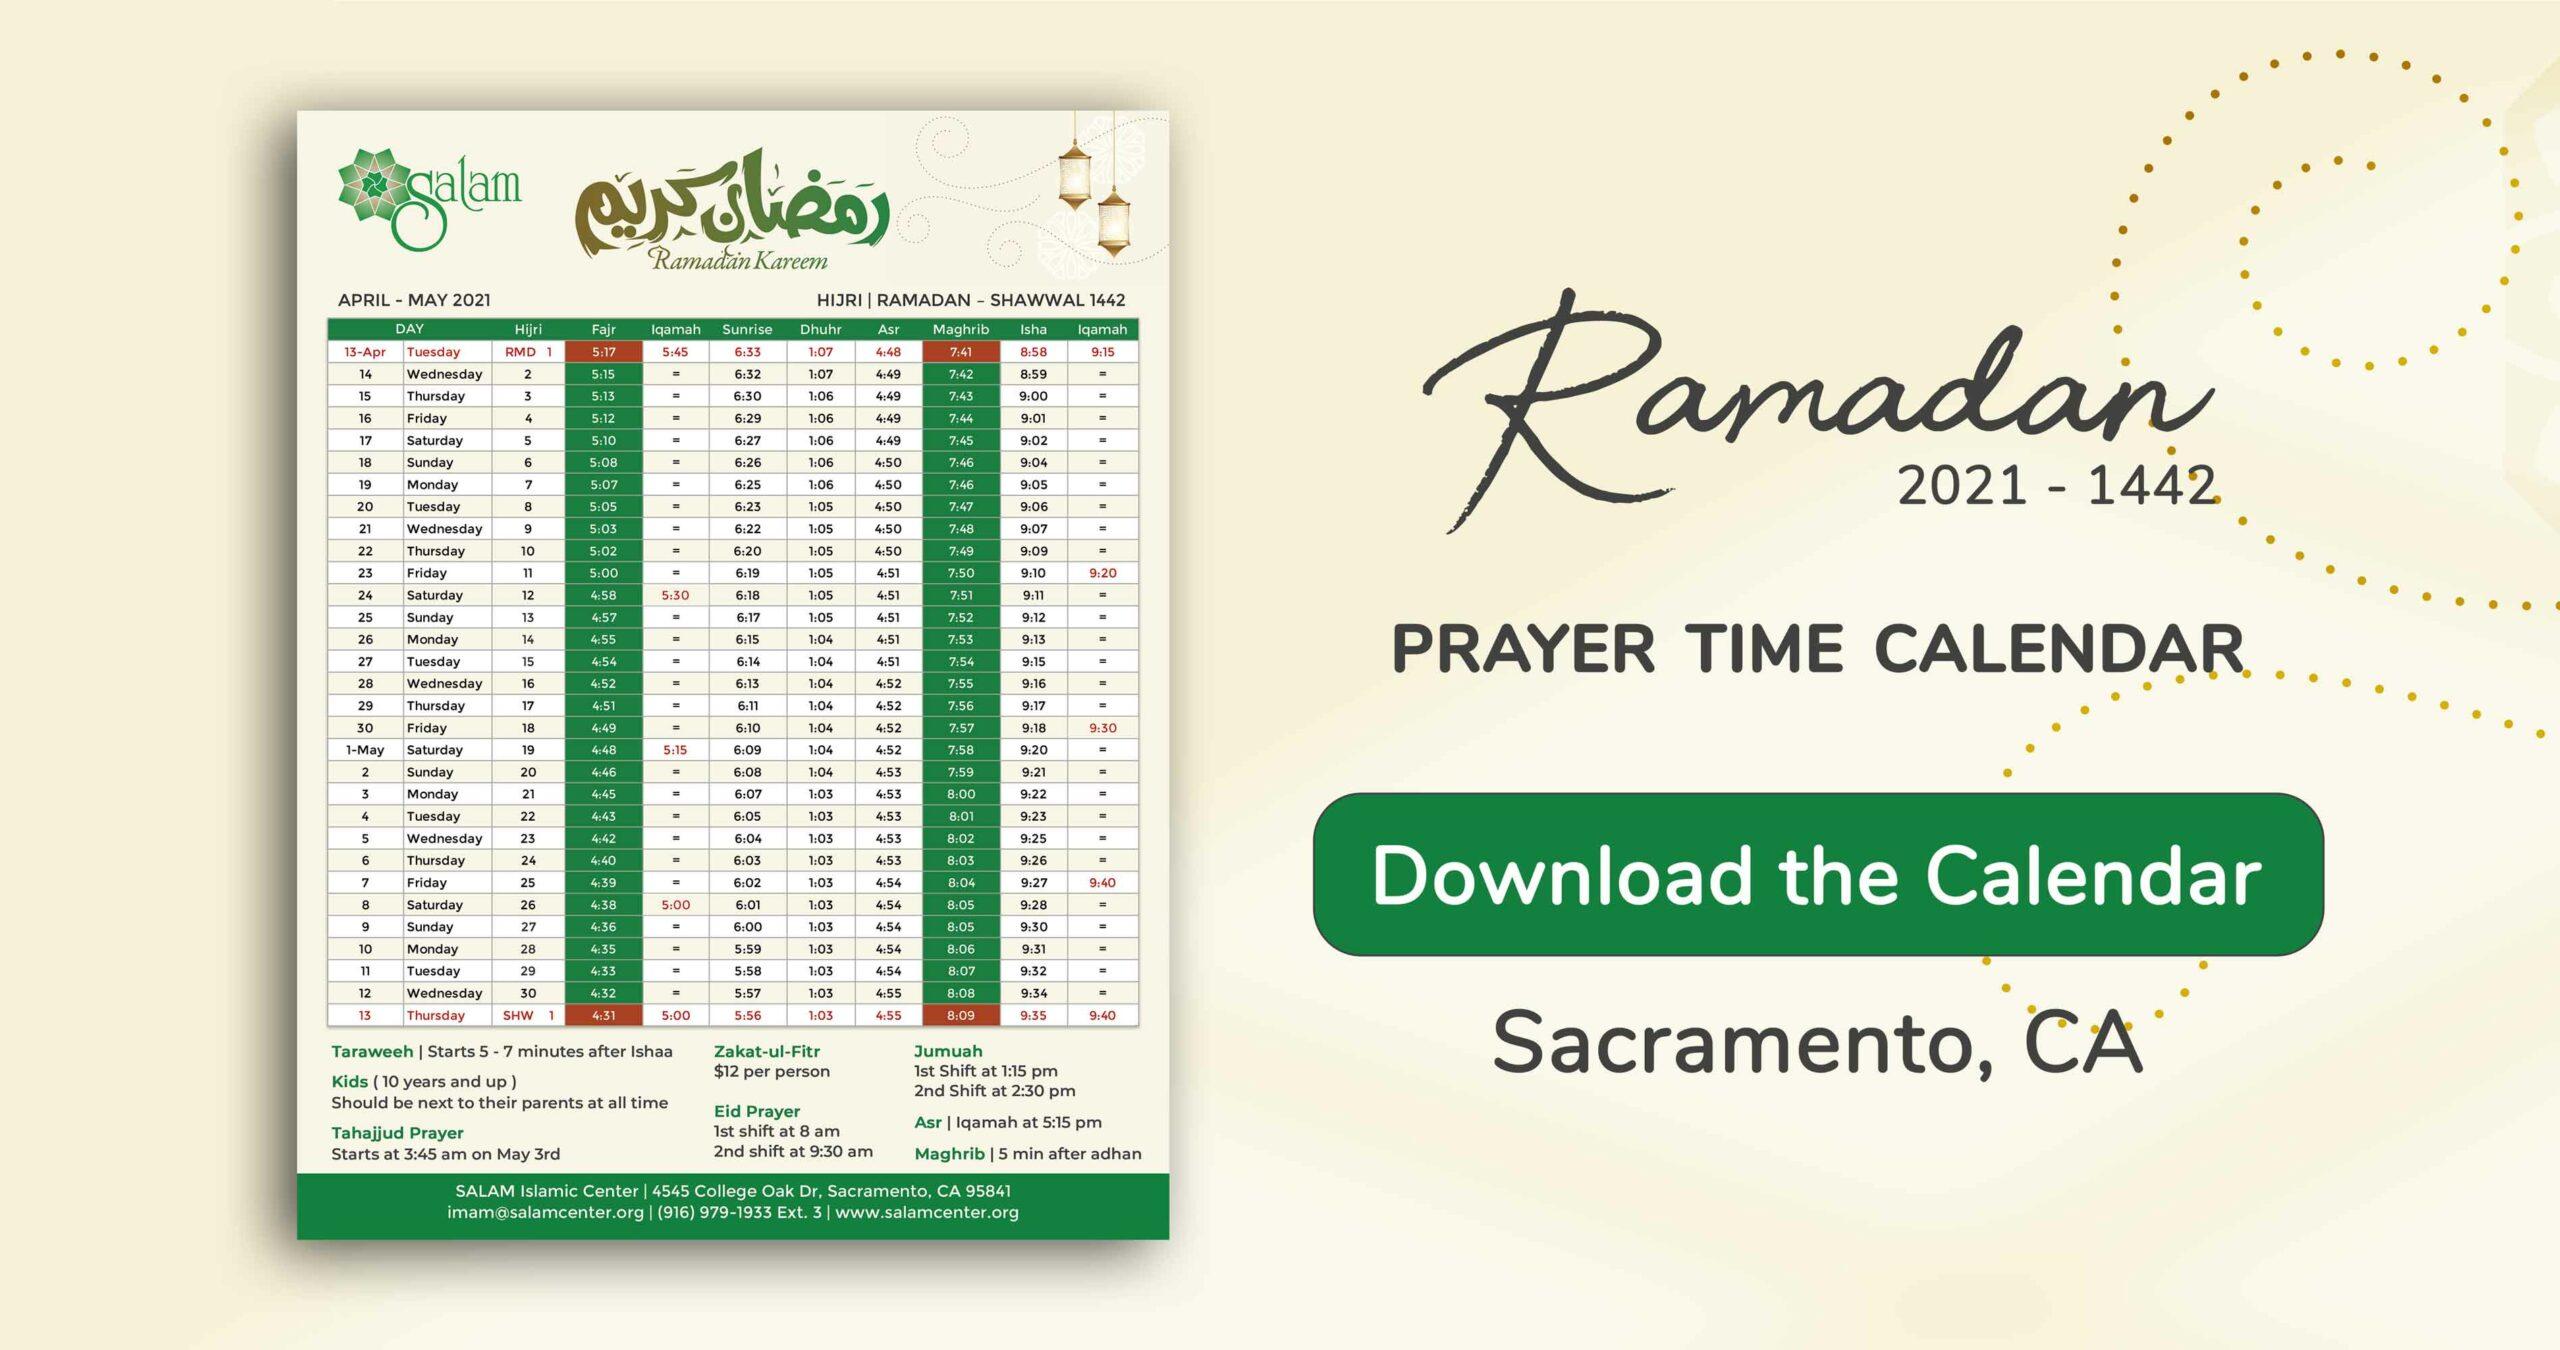 Ramadan SALAM Sacramento Prayer Times and Iqama Calendar 2021